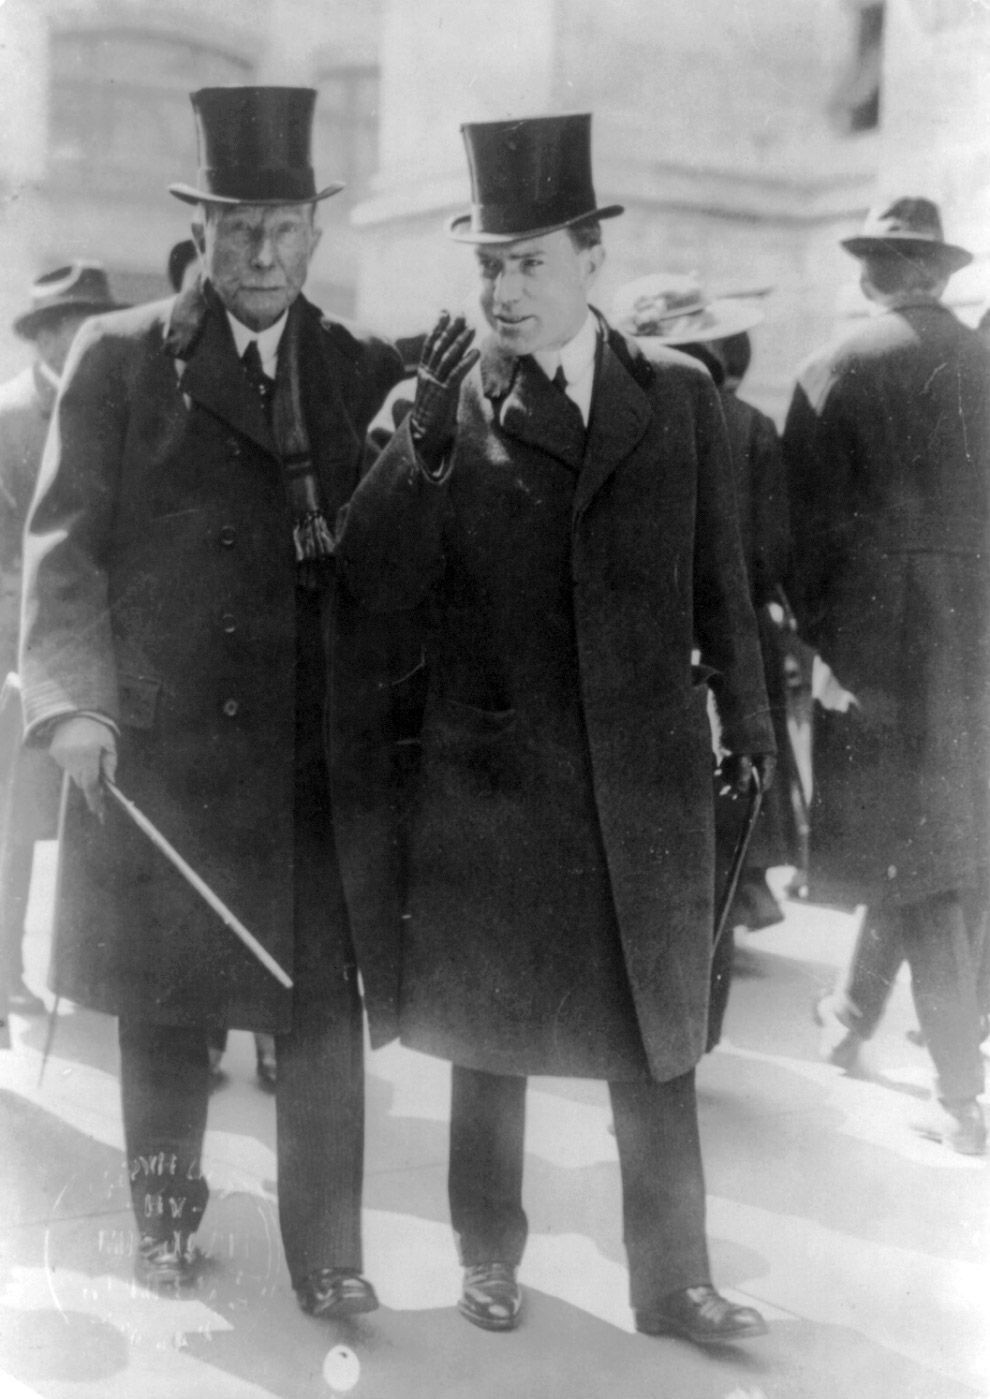 ���� ��������� � ����� � 1915 ����